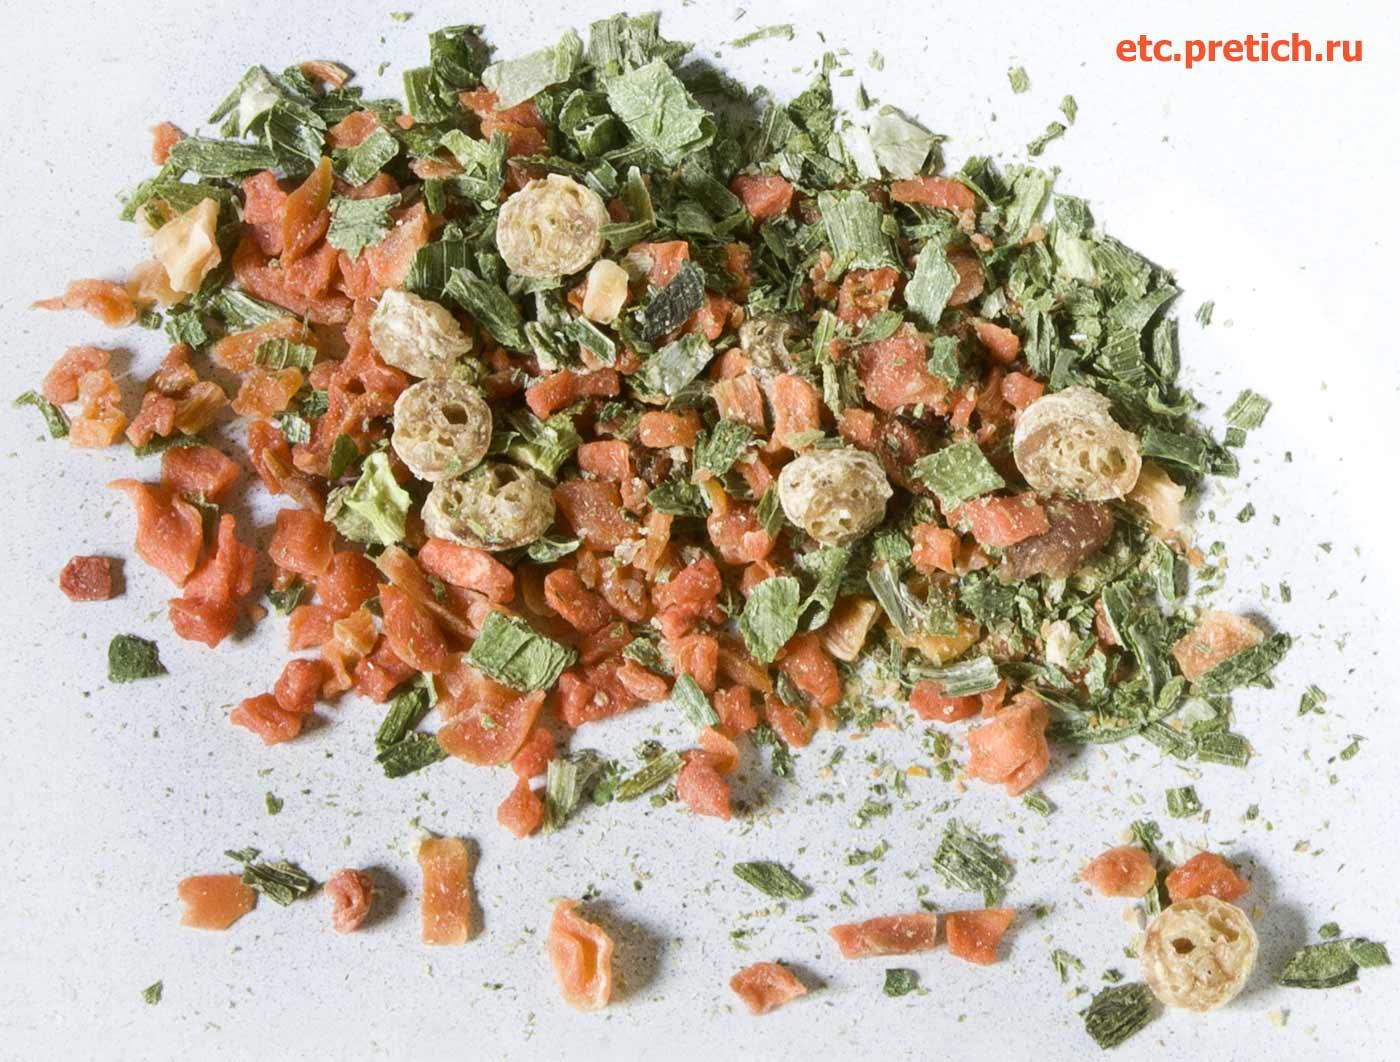 Big Bon Disсovery лапша БП сушеные овощи для сальса